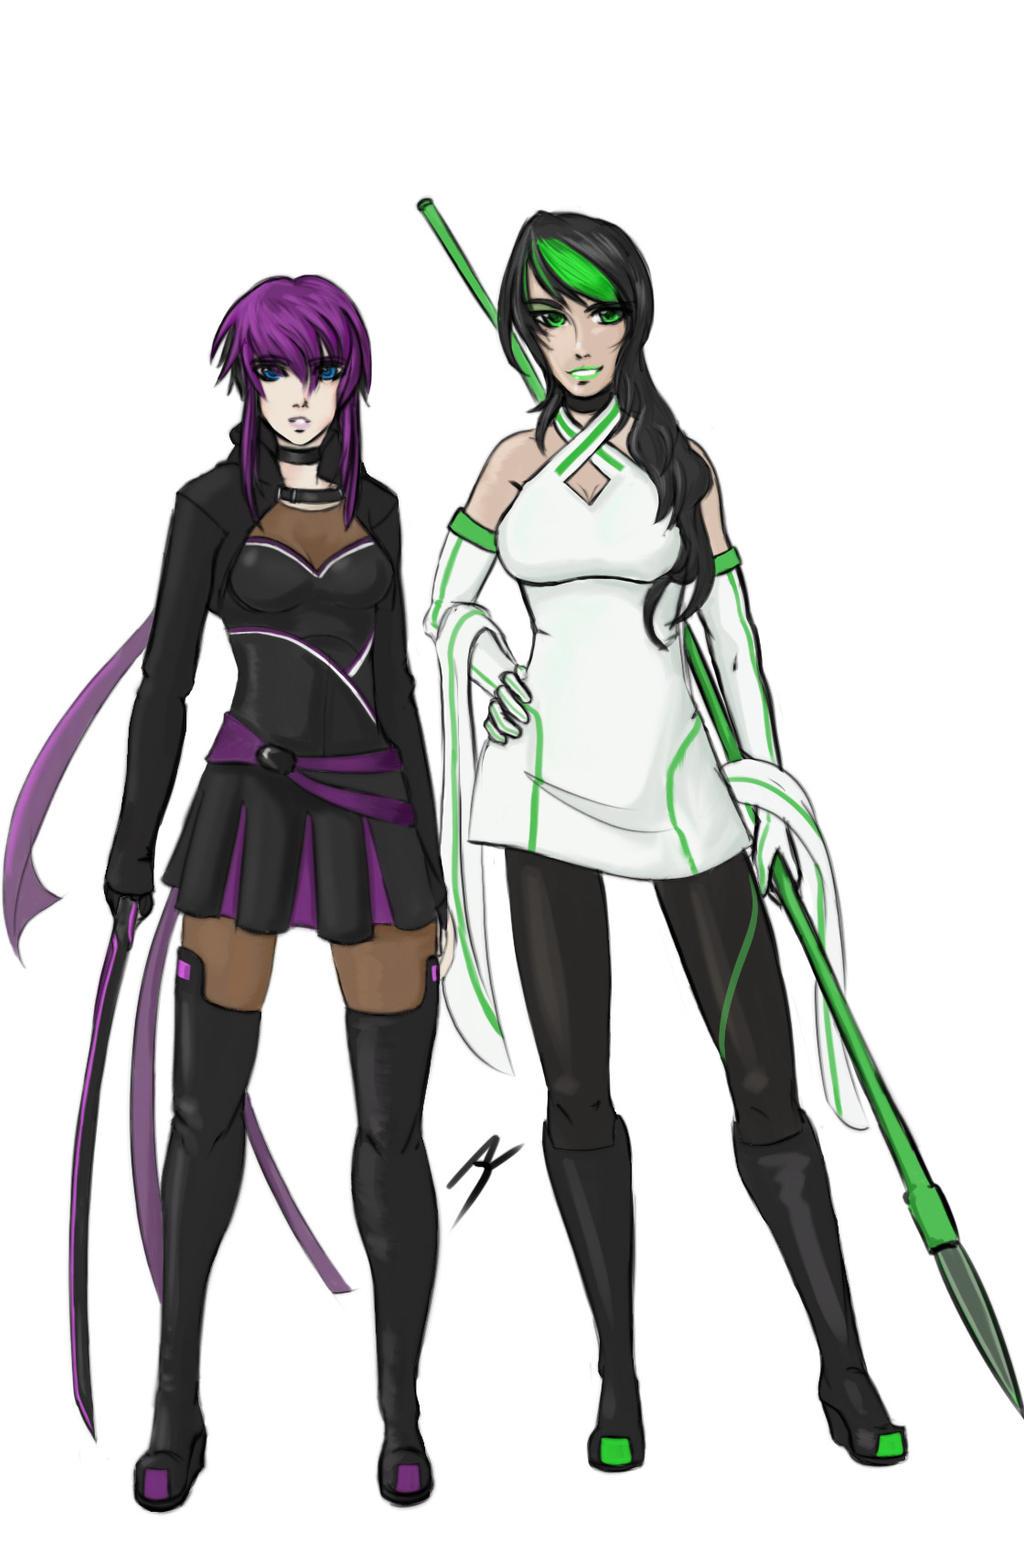 Original Characters - Renata and Lucrezia